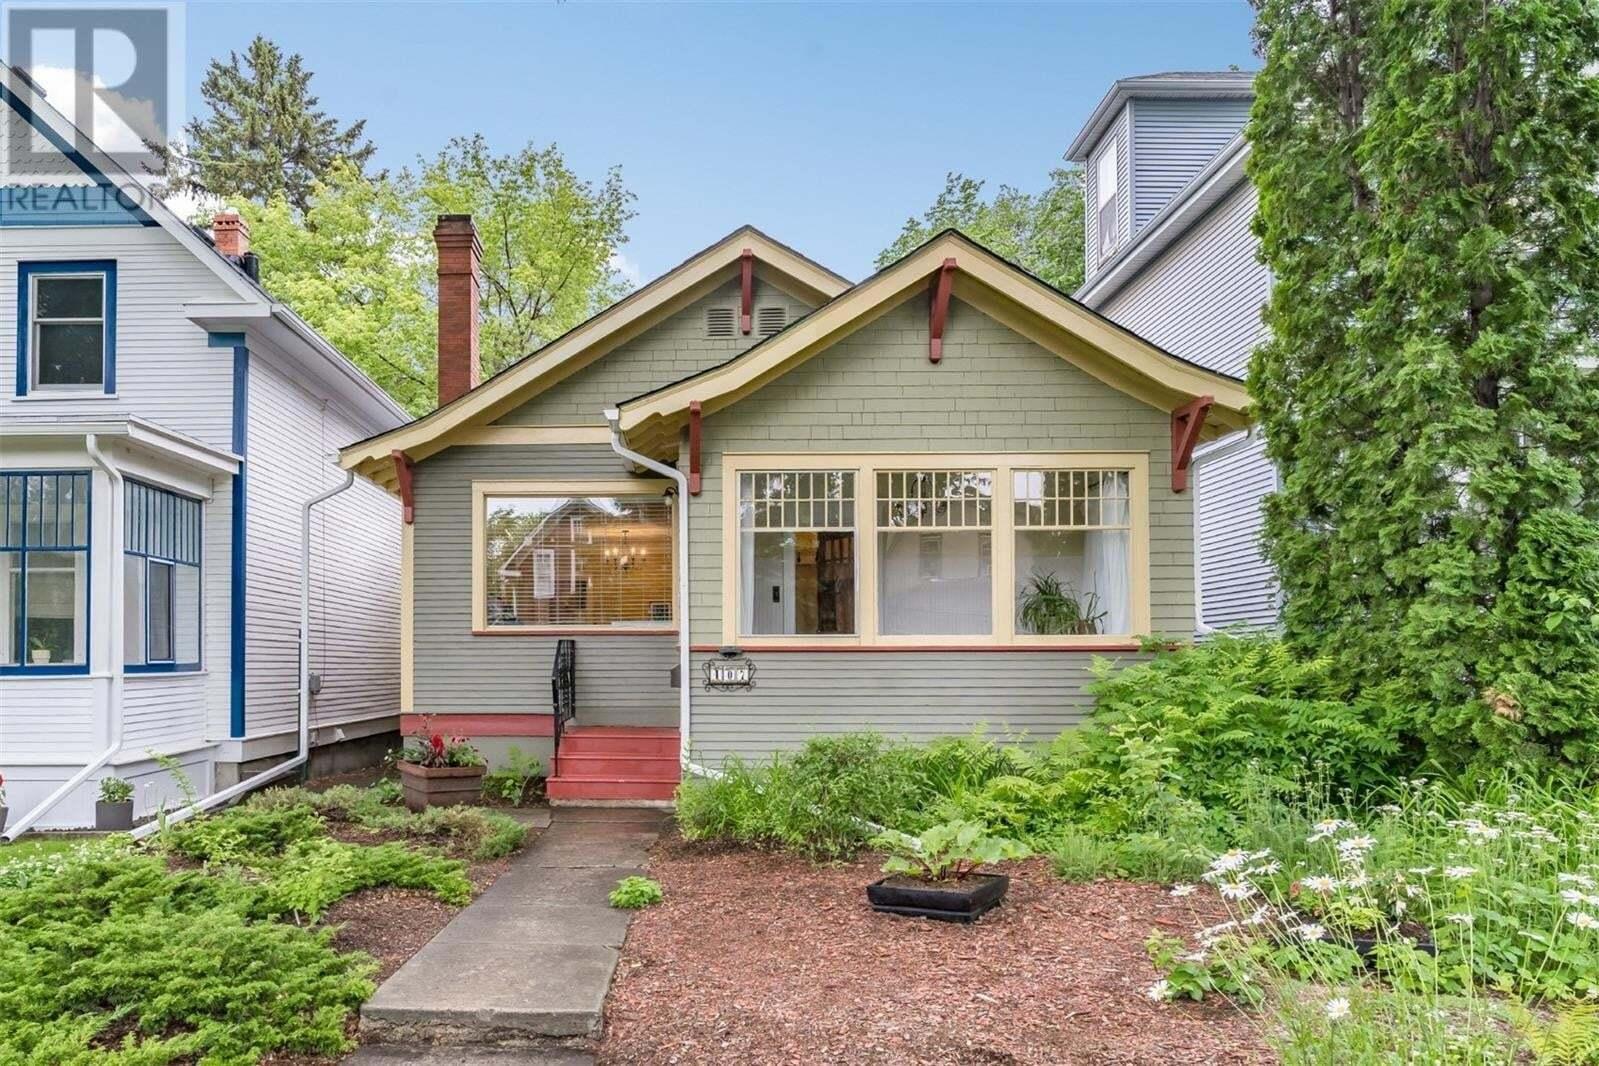 House for sale at 407 28th St W Saskatoon Saskatchewan - MLS: SK814943